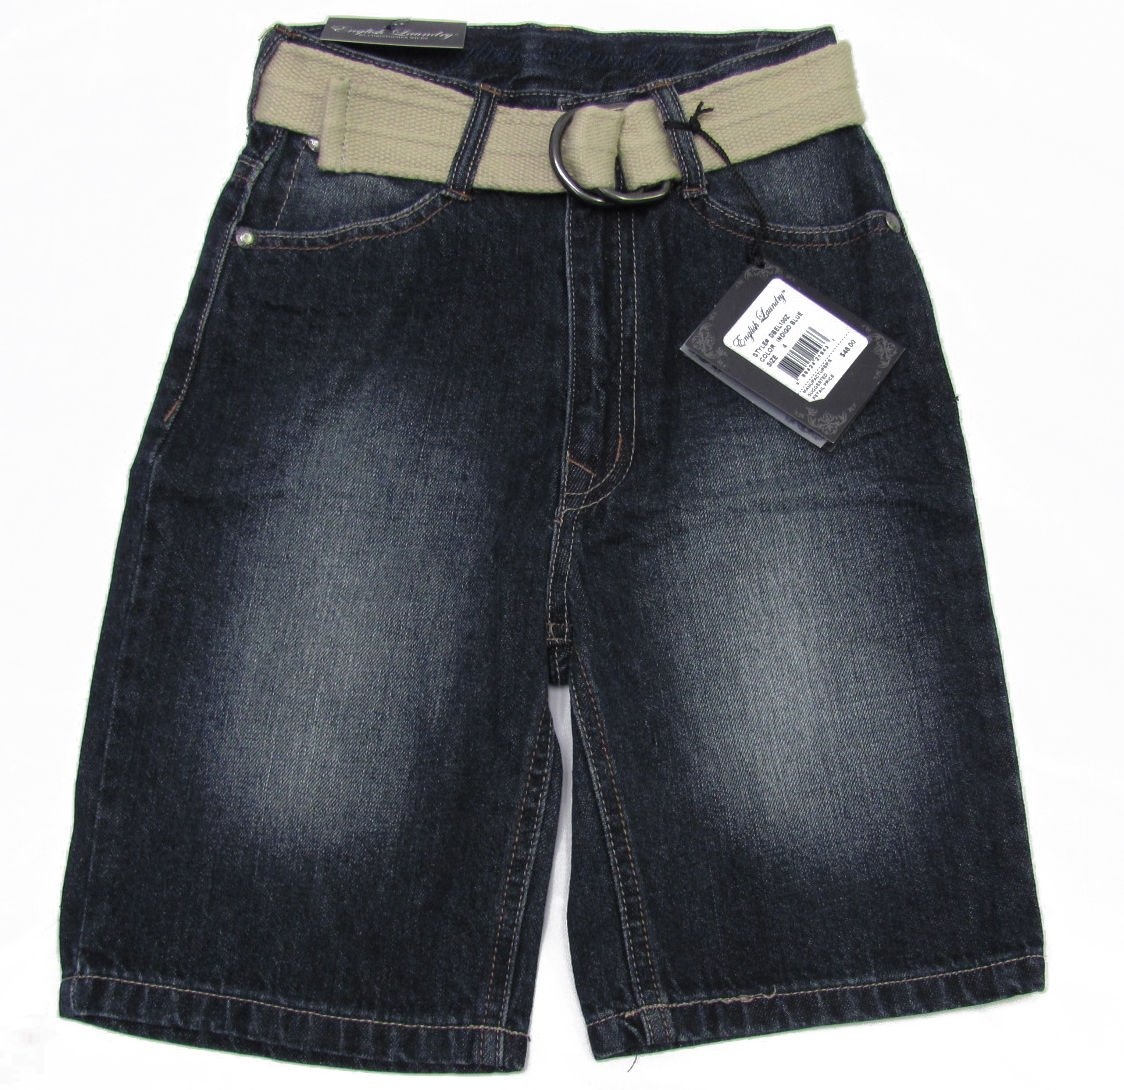 English Laundry Boys size 12 Dark Blue Jean Shorts with Belt New